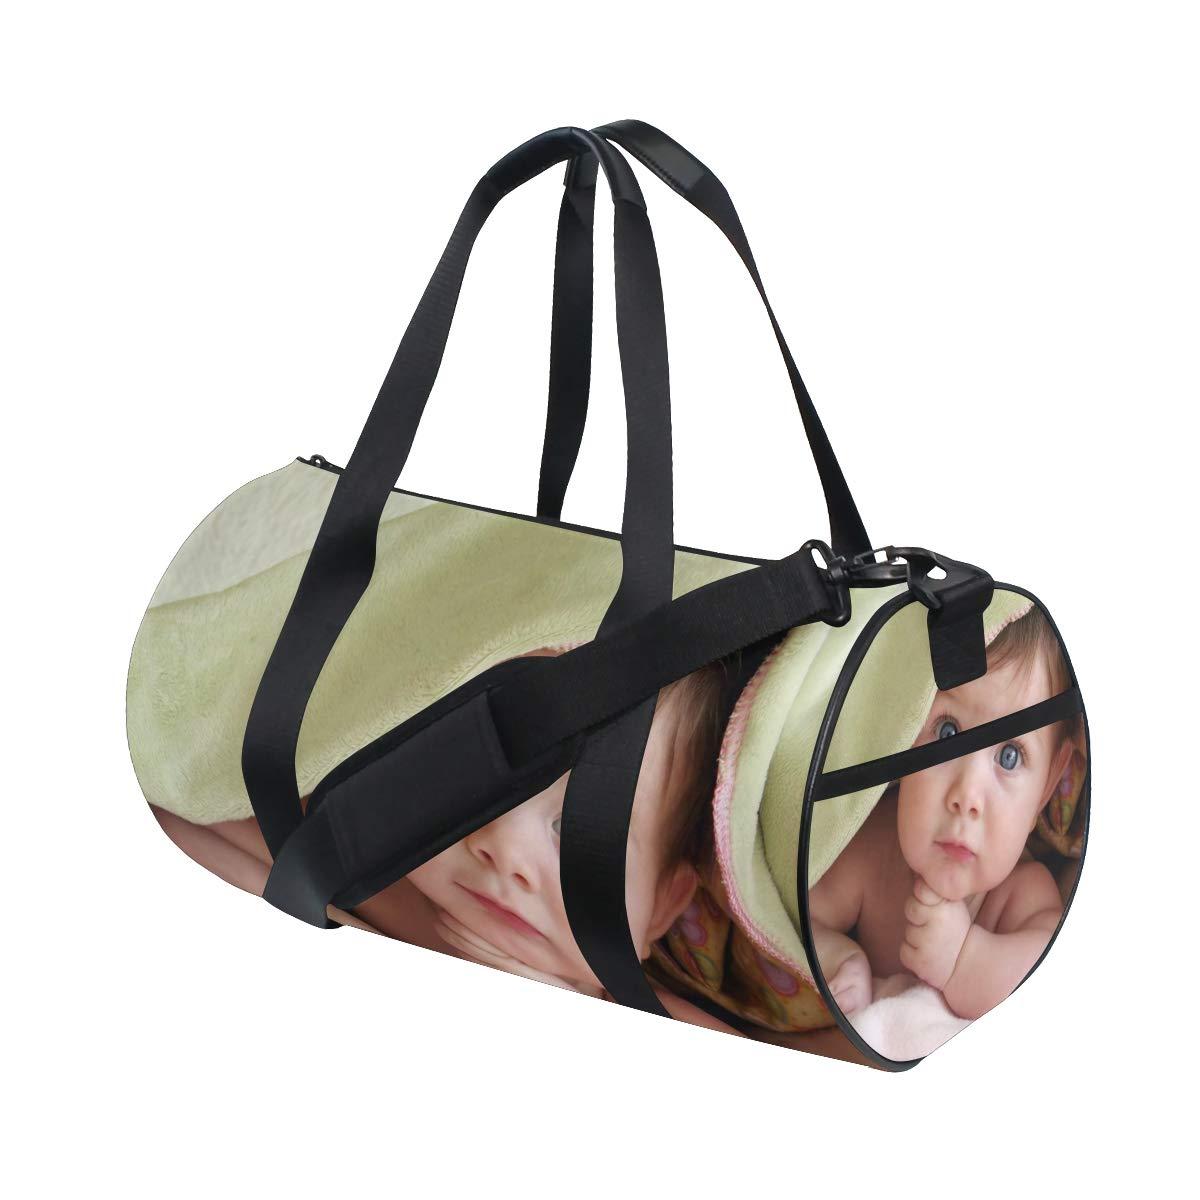 58325c652861 Amazon.com: OuLian Sports Bag Cute Pineapple Art Mens Duffle Luggage ...